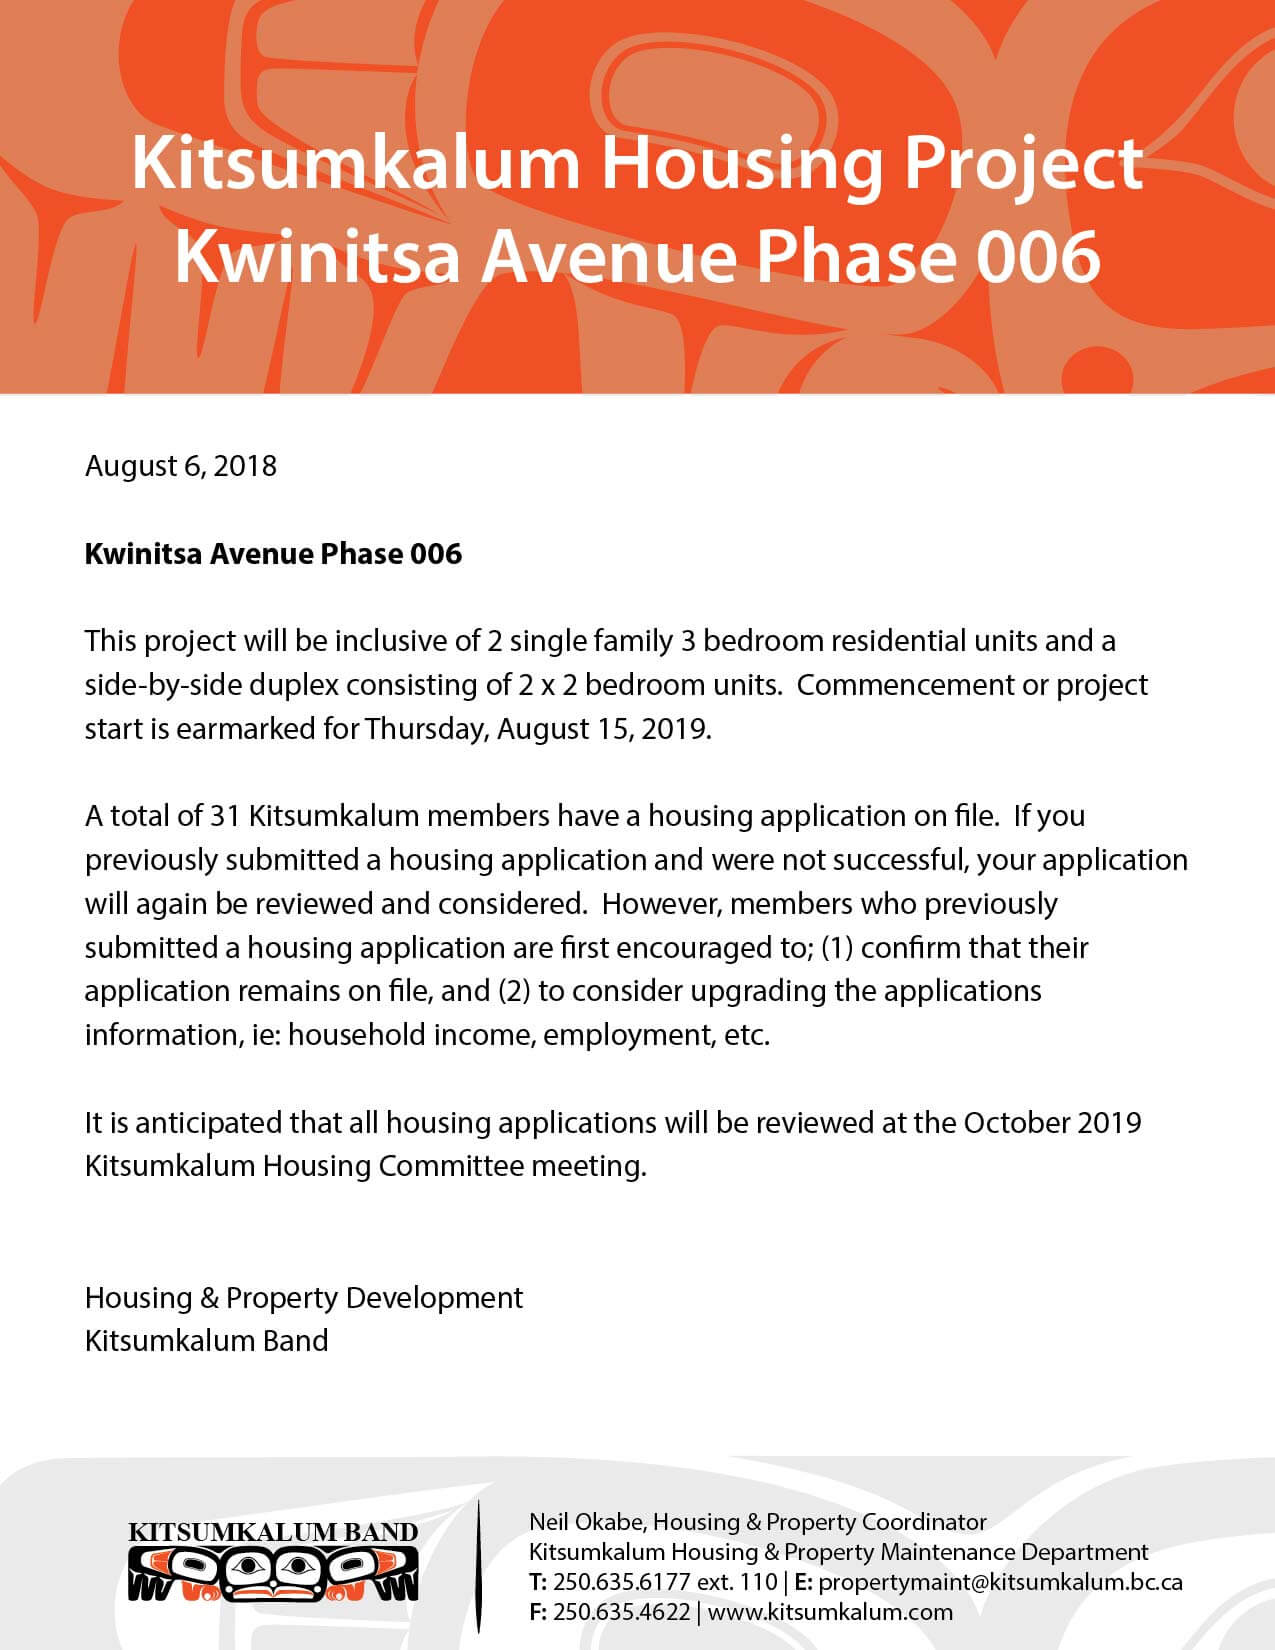 Kwinitsa Phase 006 – Kitsumkalum Housing Project